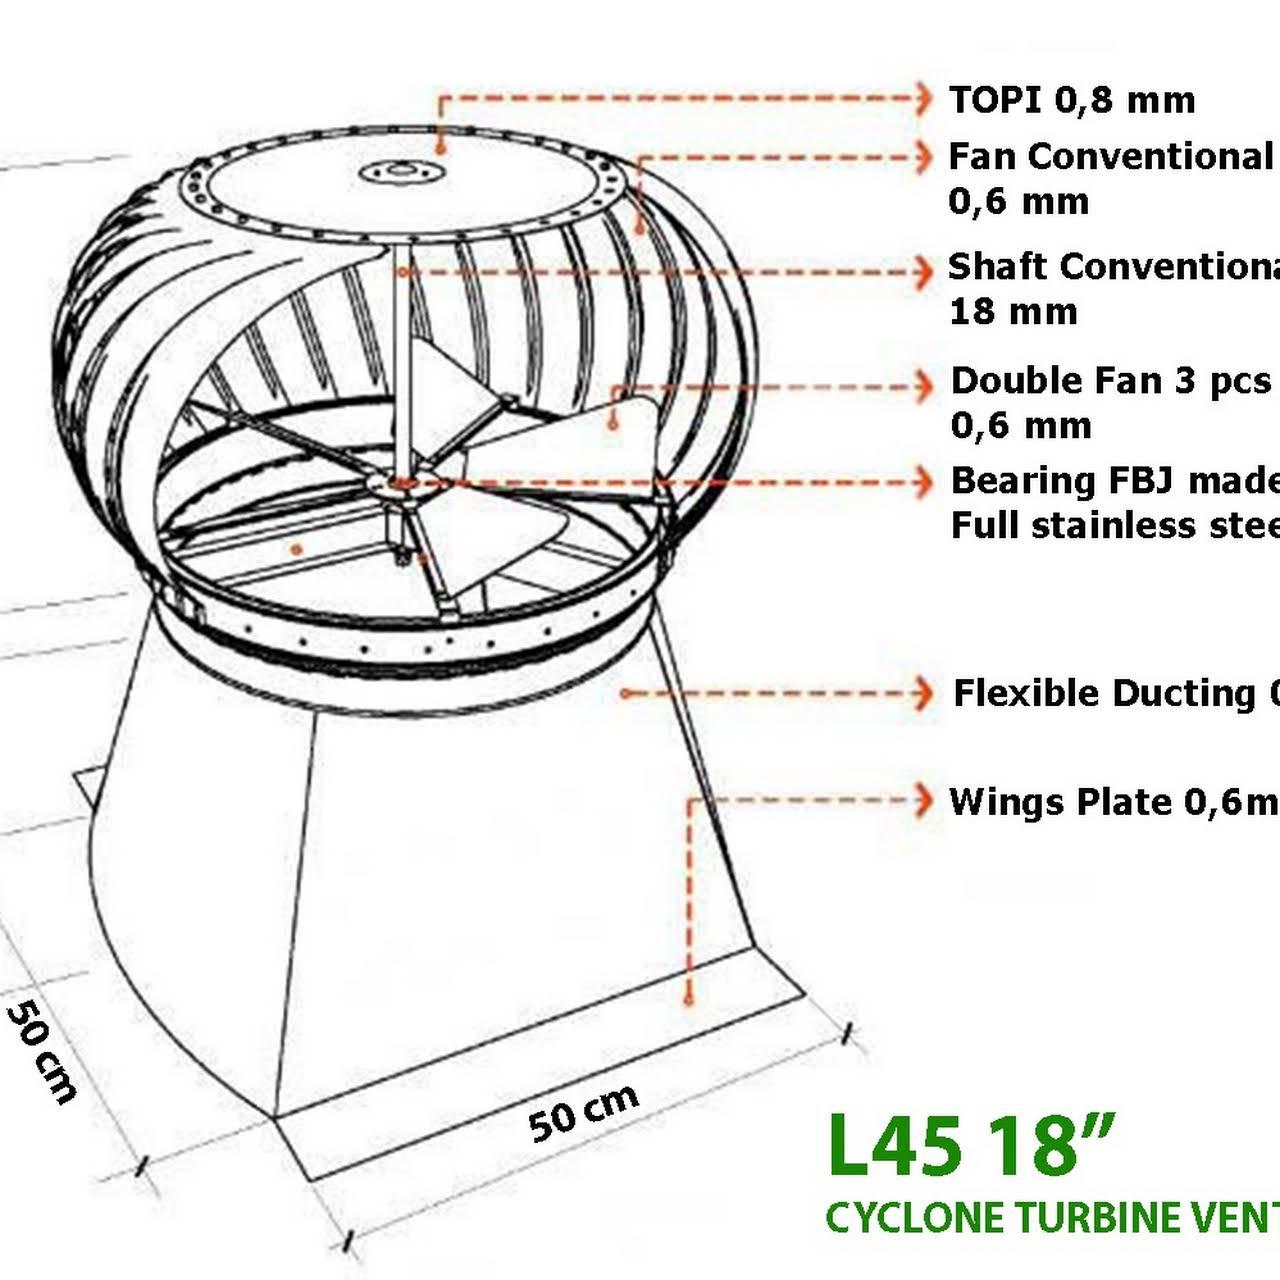 Jual Cyclone Turbine Ventilator Bali 04